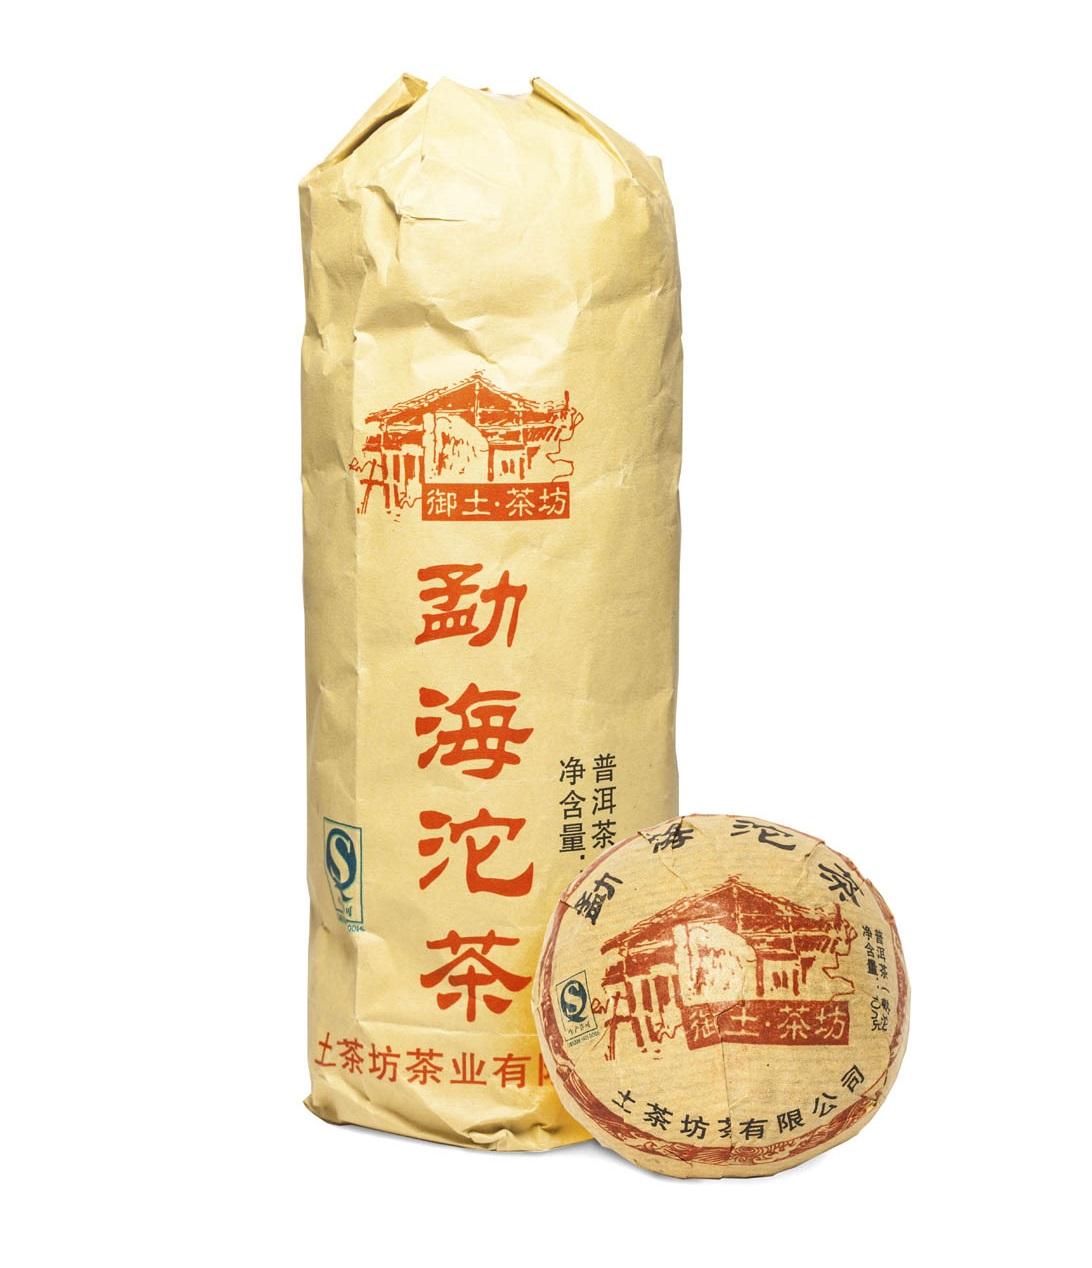 Чай китайский элитный Шу Пуэр (То Ча) 92-100 г., 2013 г., фабрика Юннань